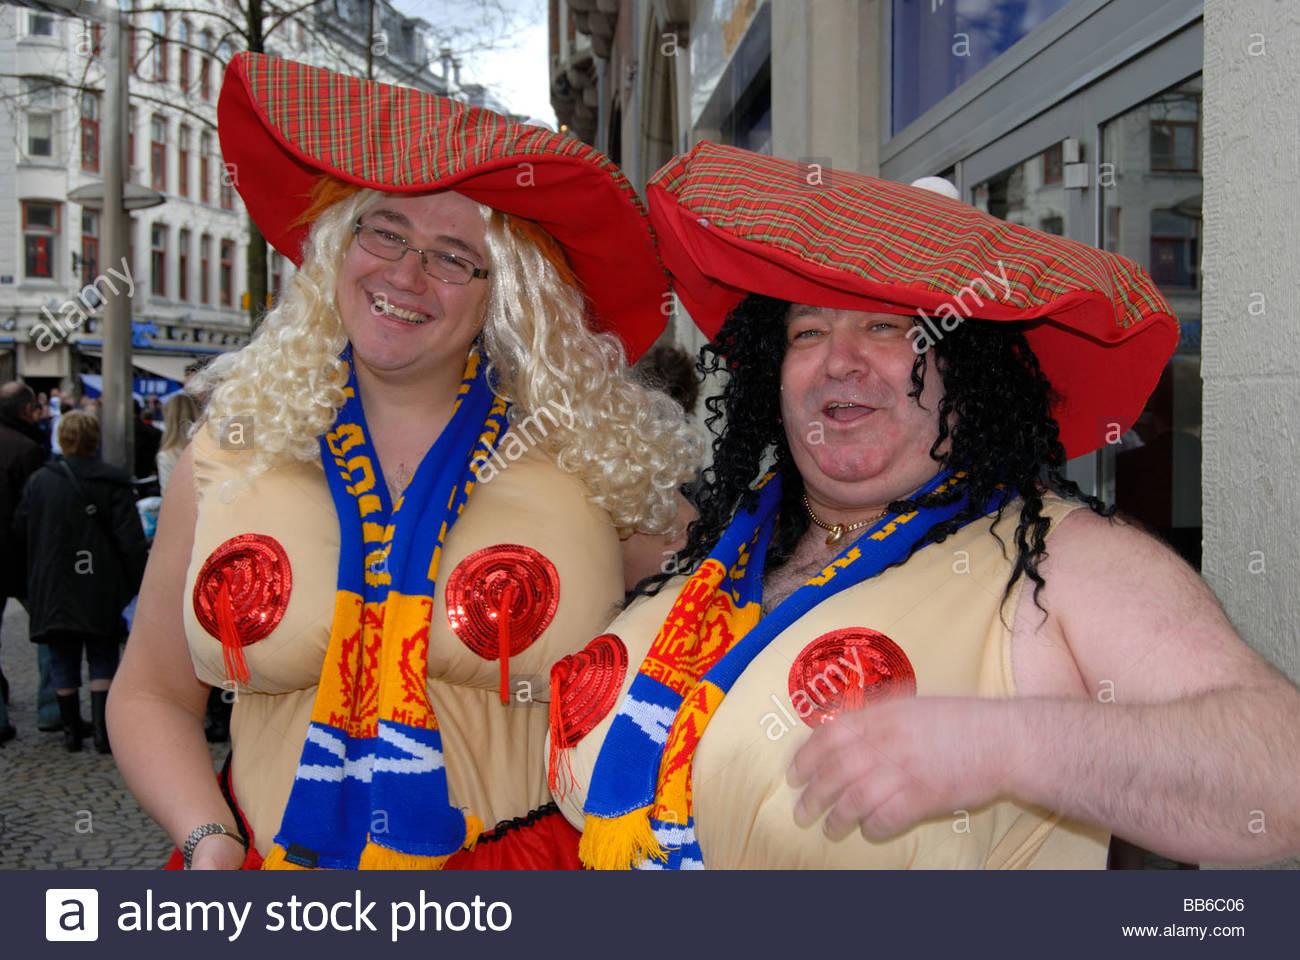 amsterdam-2009-world-cup-qualifier-netherlands-vs-scotland-scots-fans-BB6C06.jpg